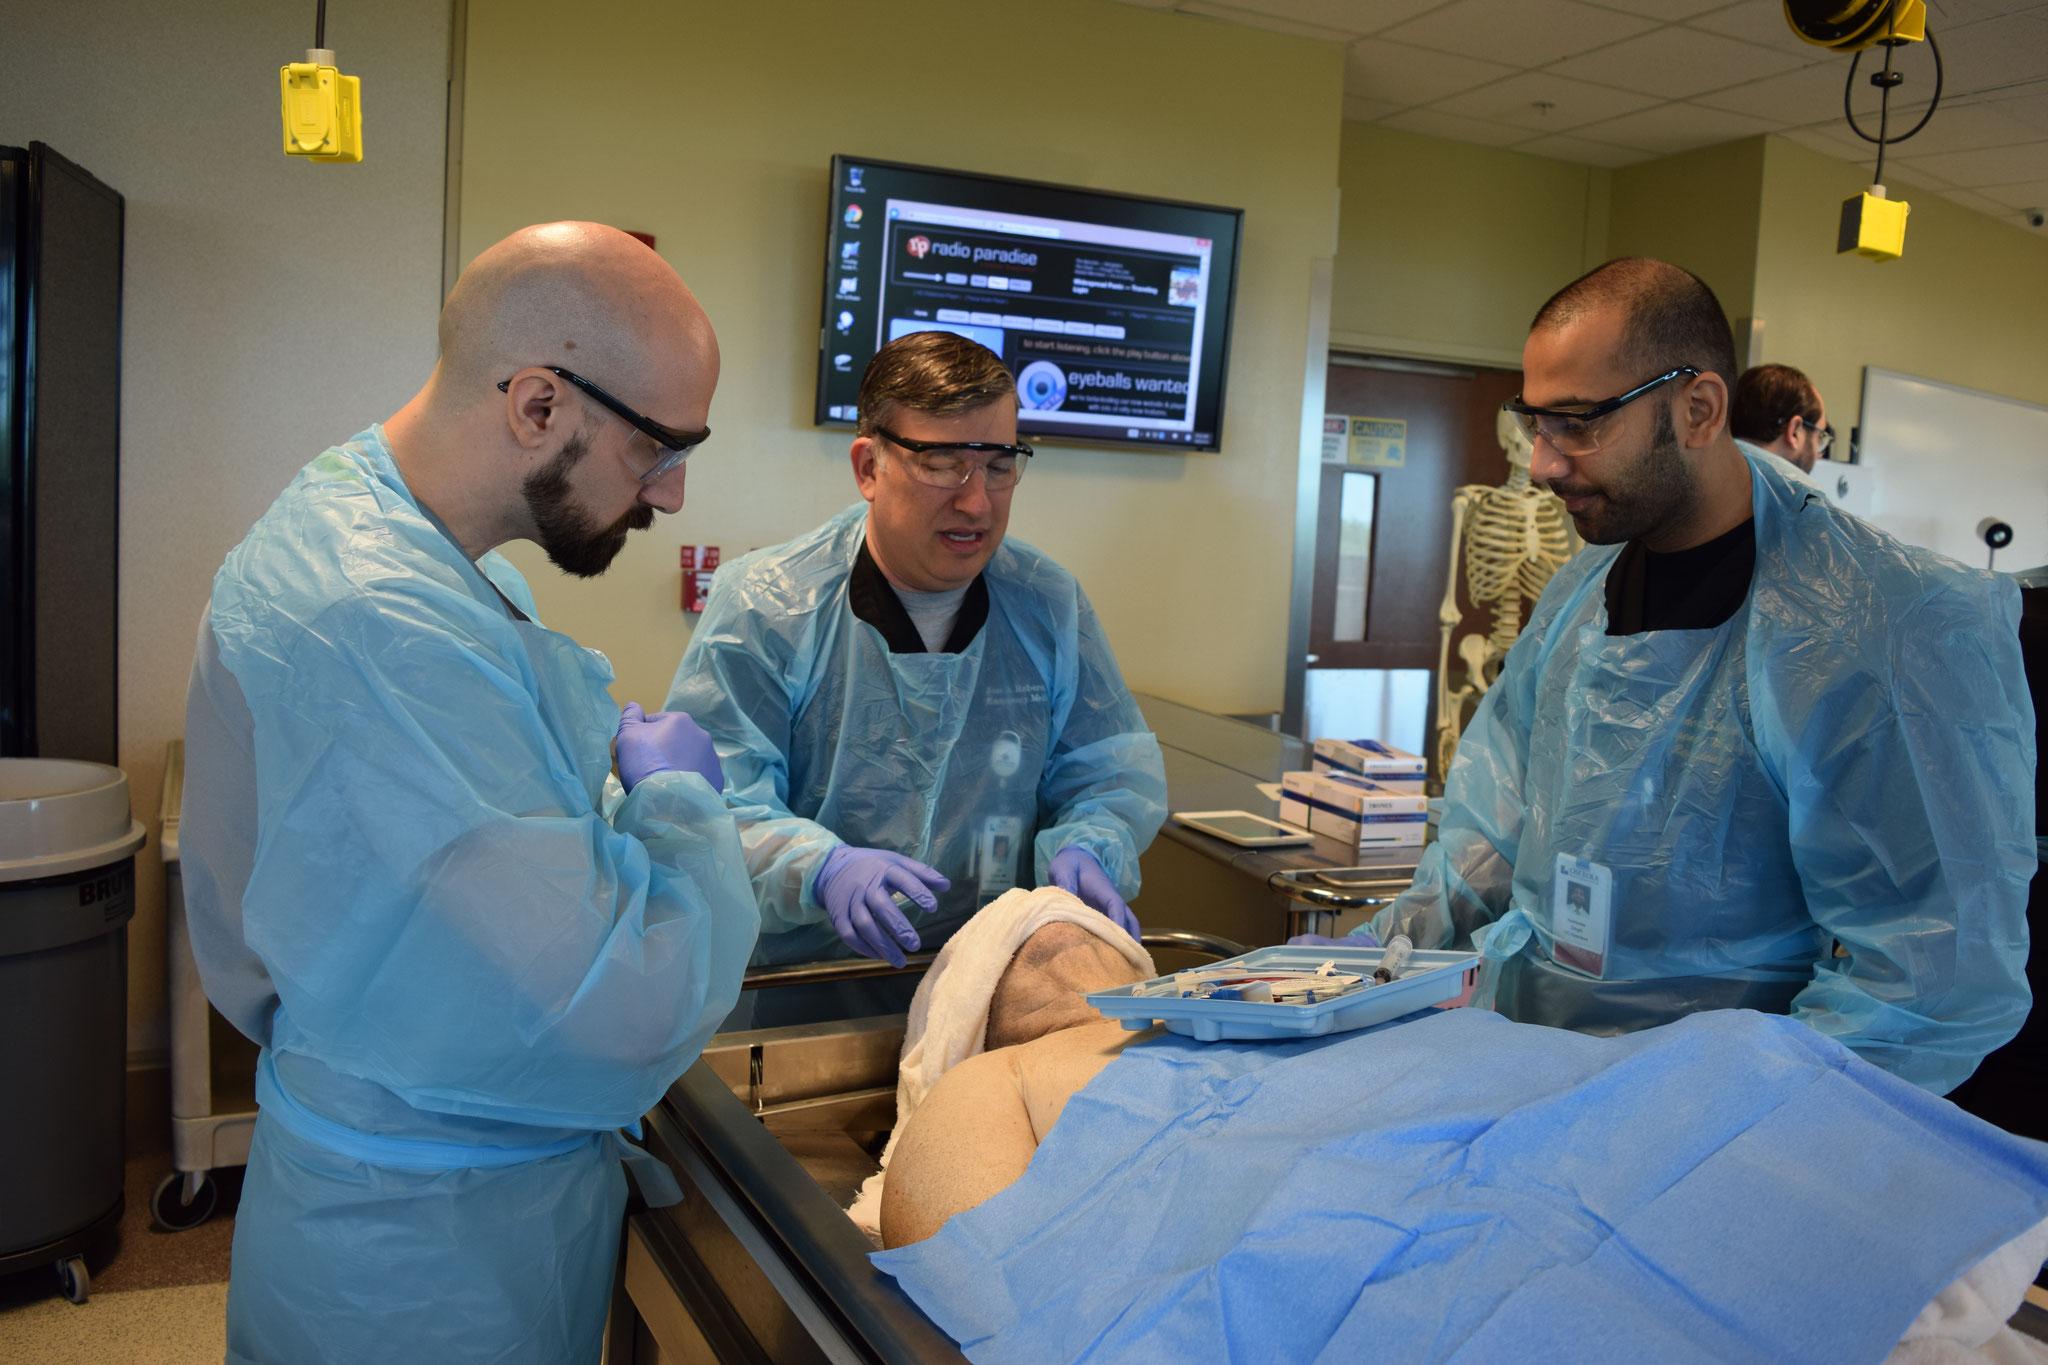 Cadaver Procedure lab